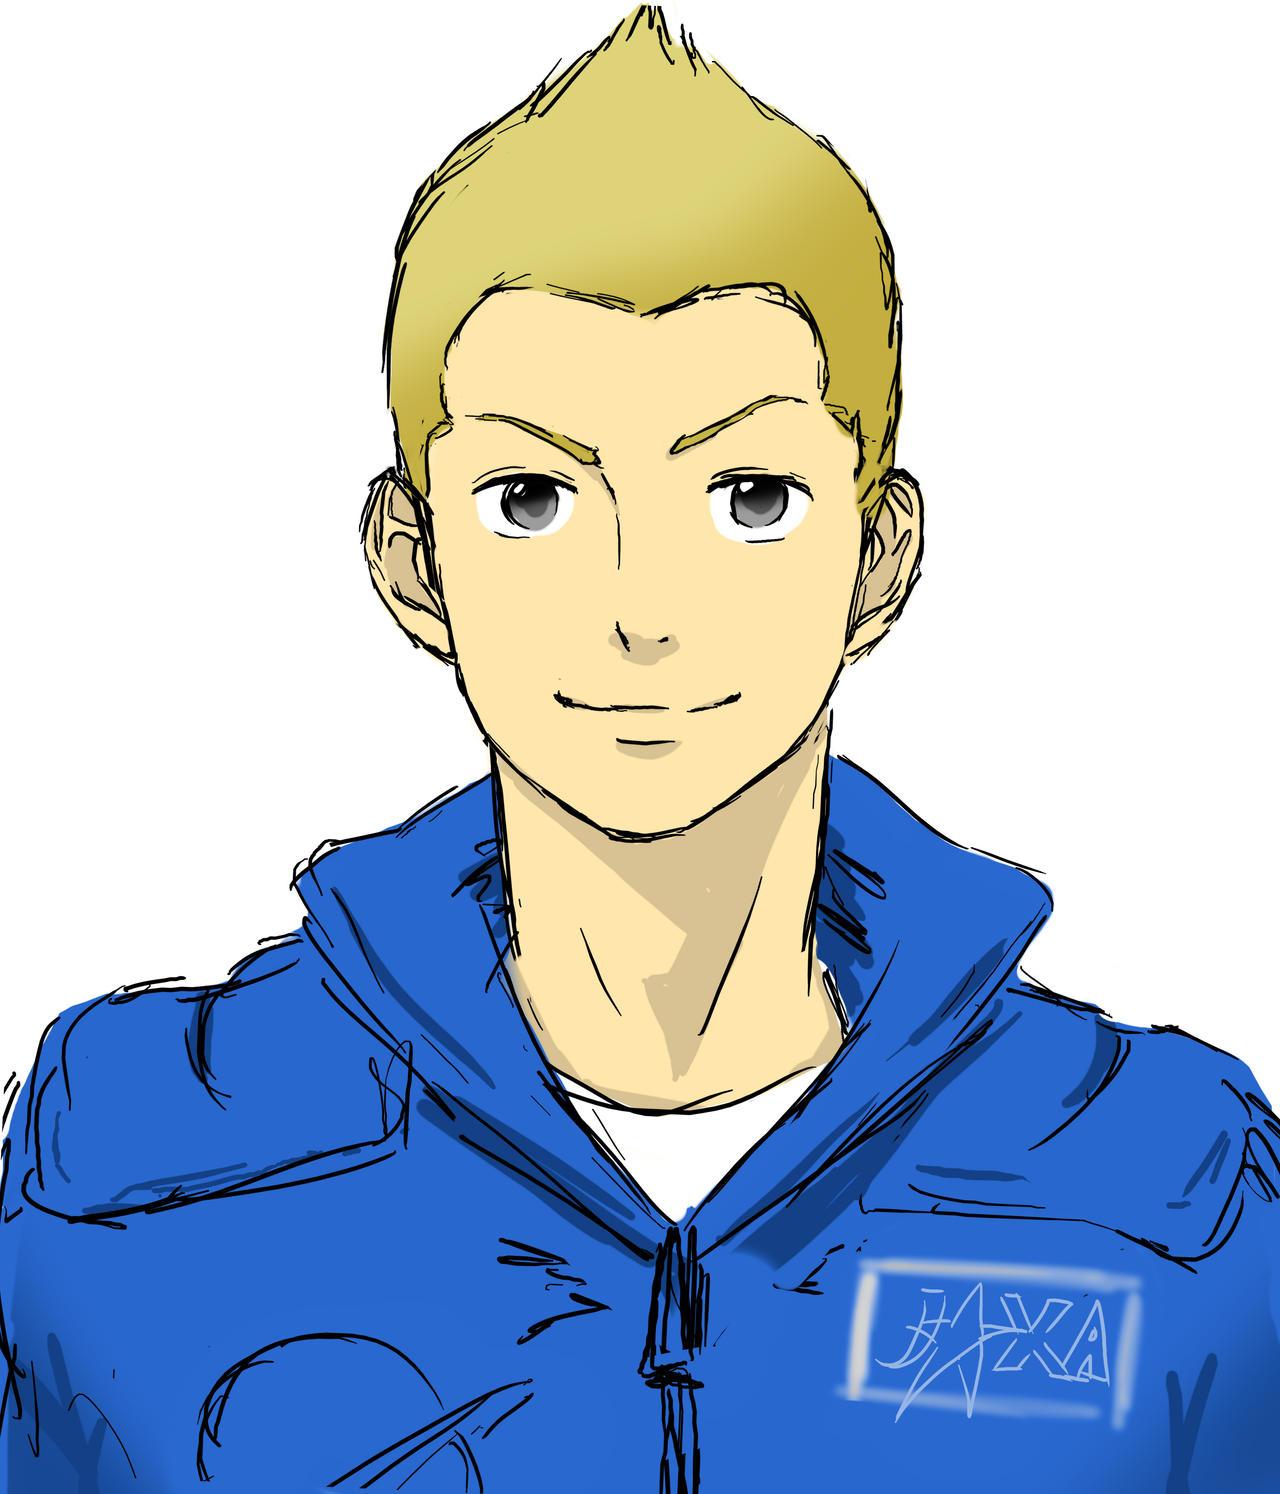 Nanba Hibito: An Astronaut by mat088